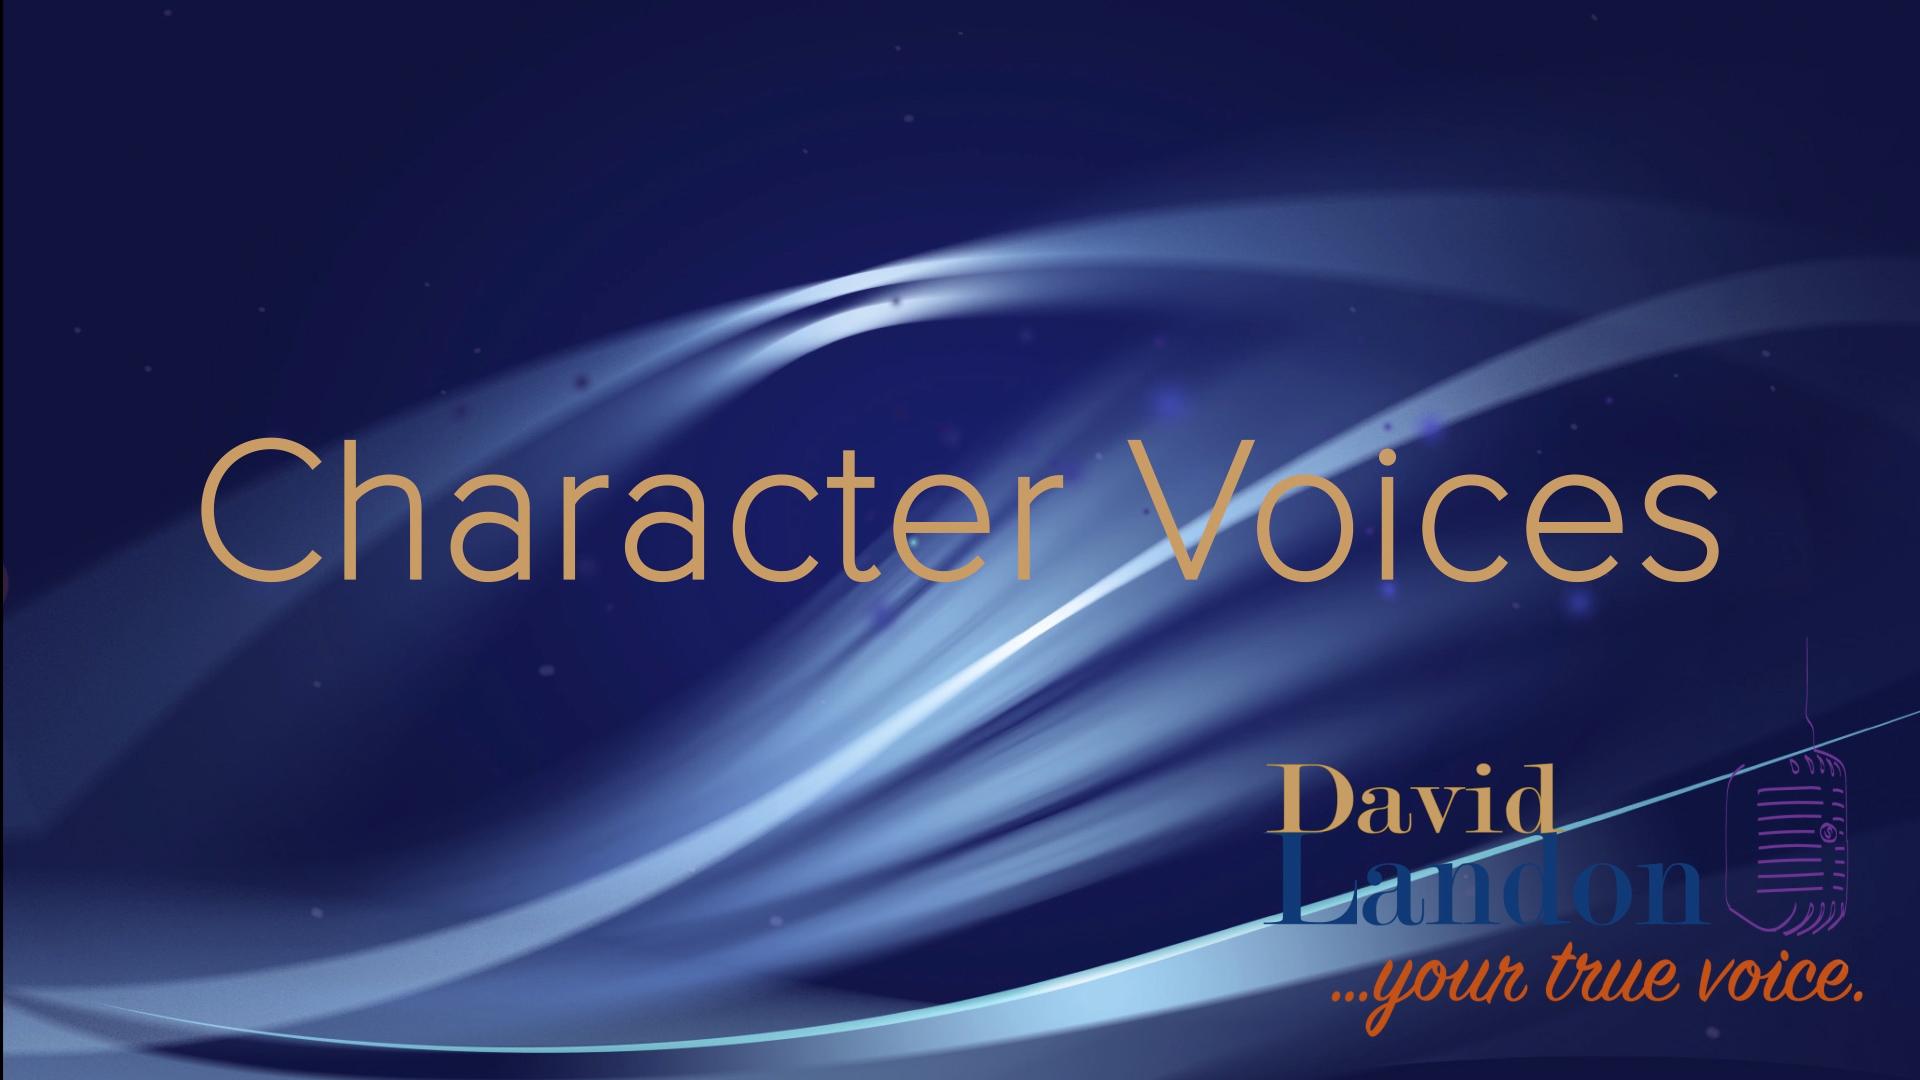 davidlandon_visualdemo_charactervoices.jpg